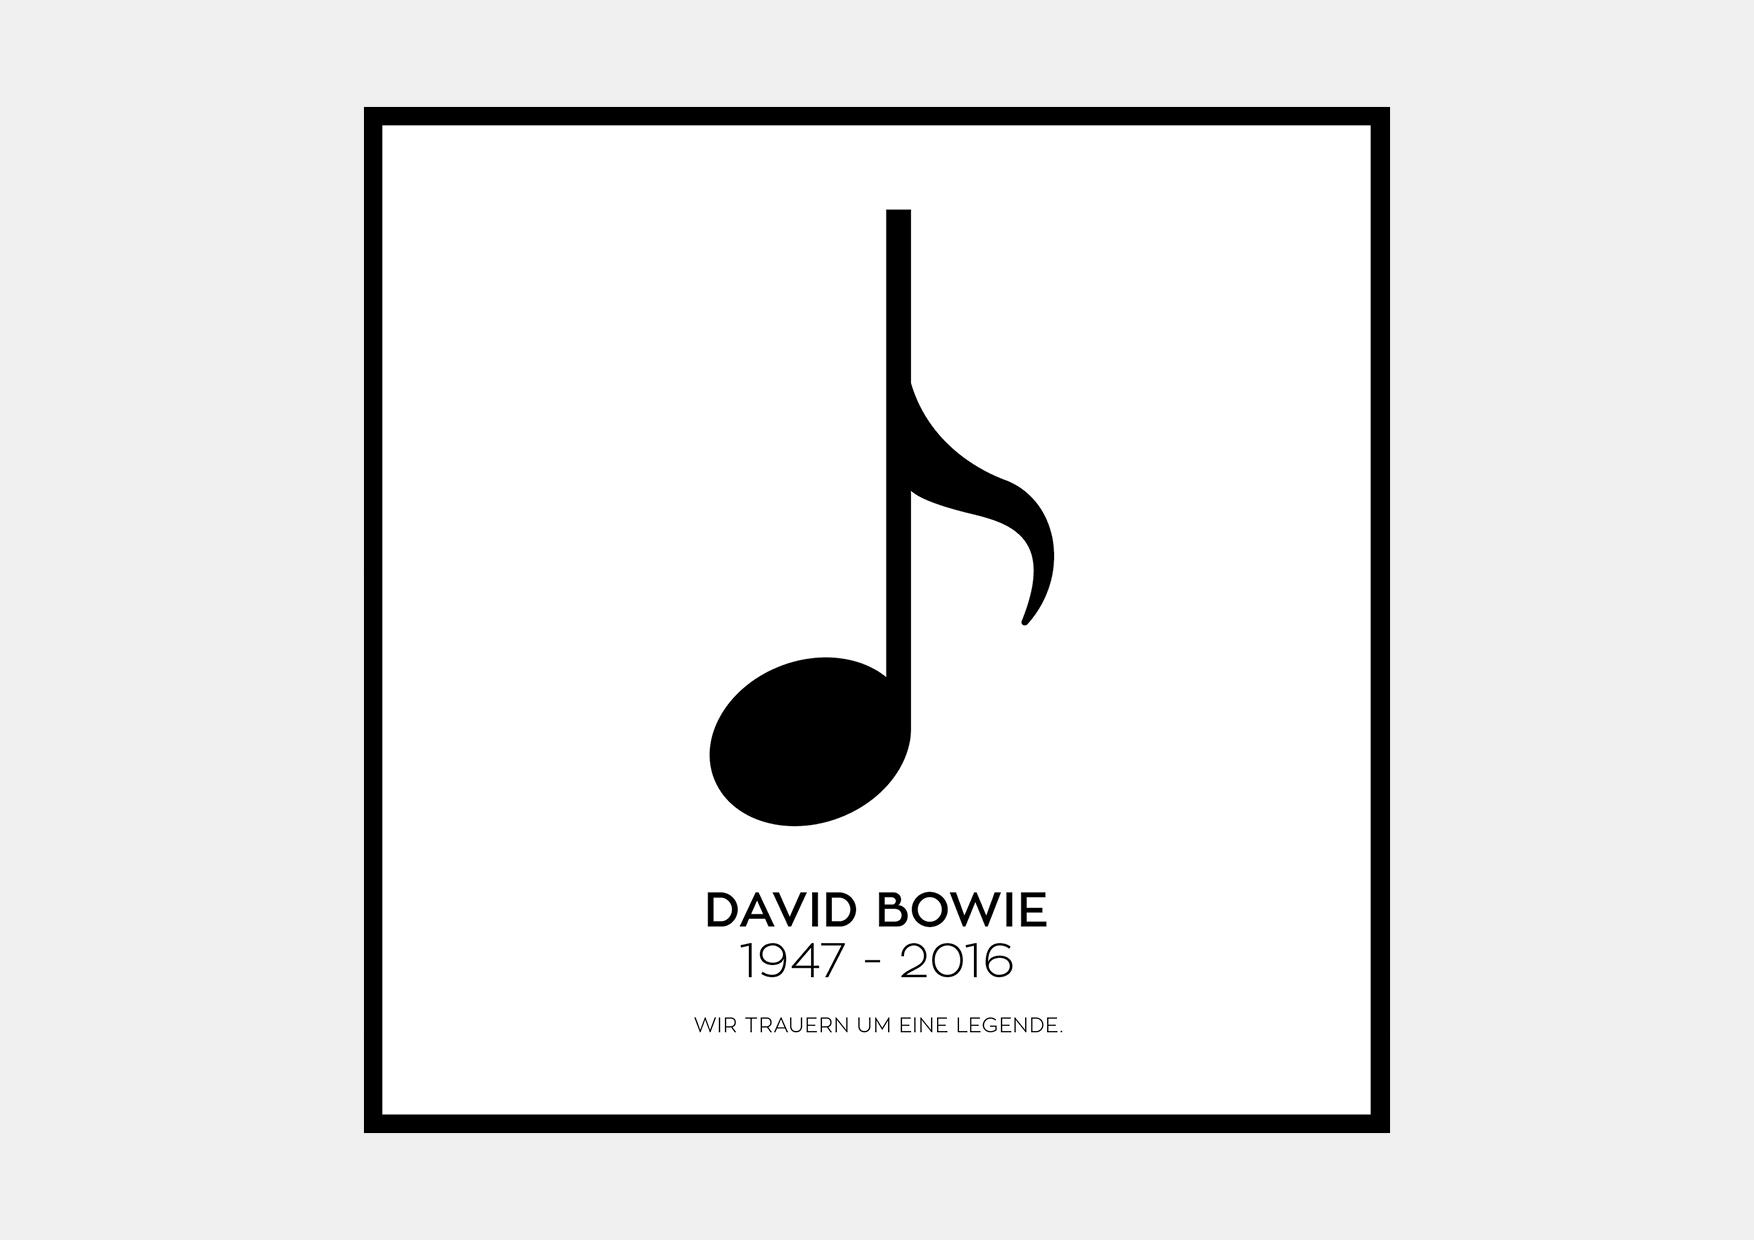 David-Bowie_2